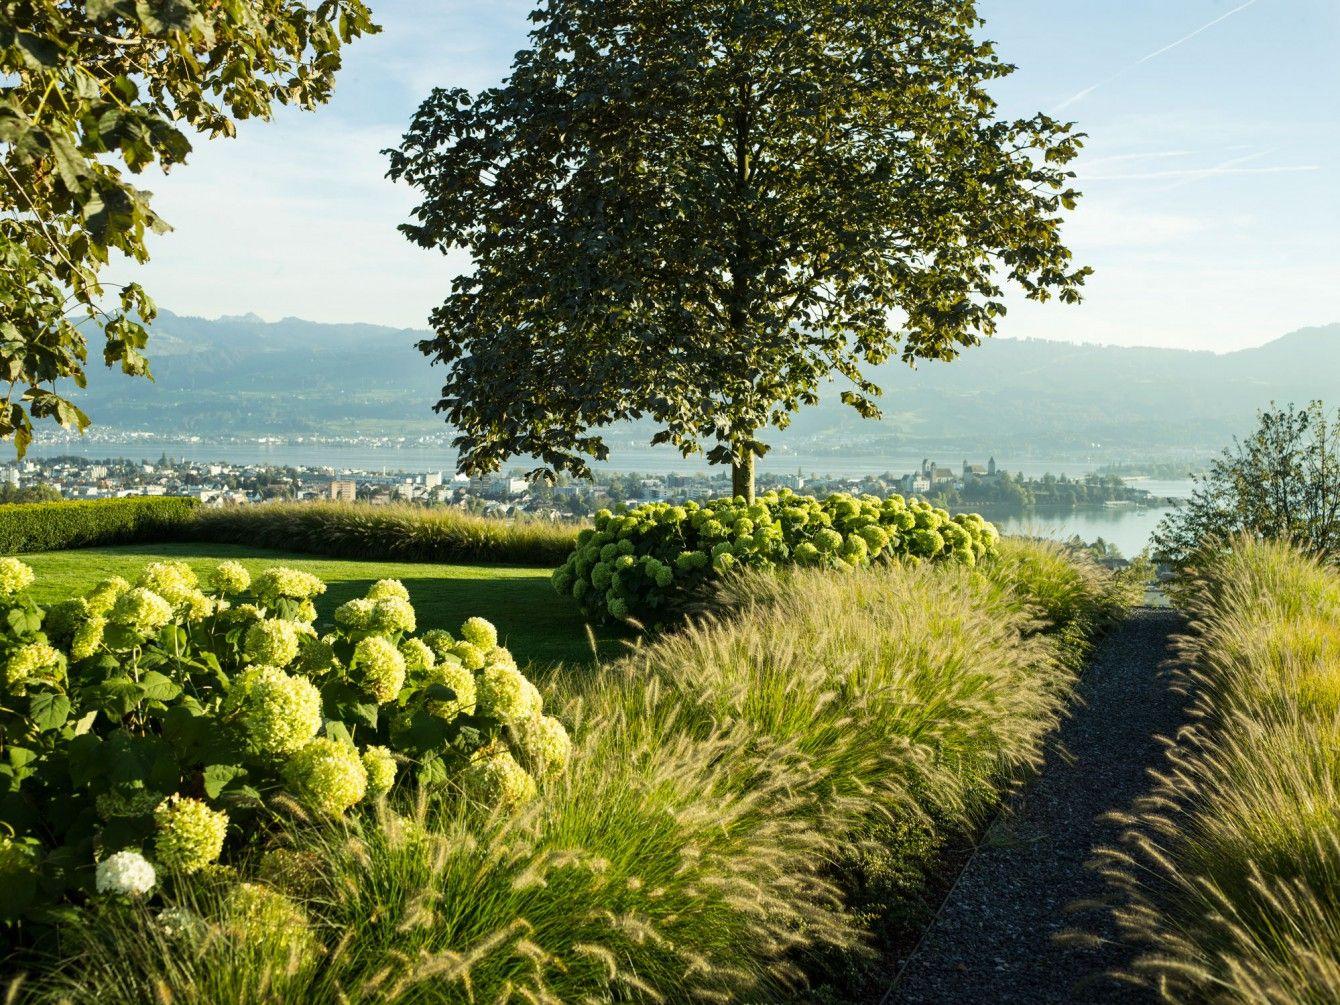 Lush landscapes by enzo enea gardendesign in the garden for Pflanzengestaltung garten